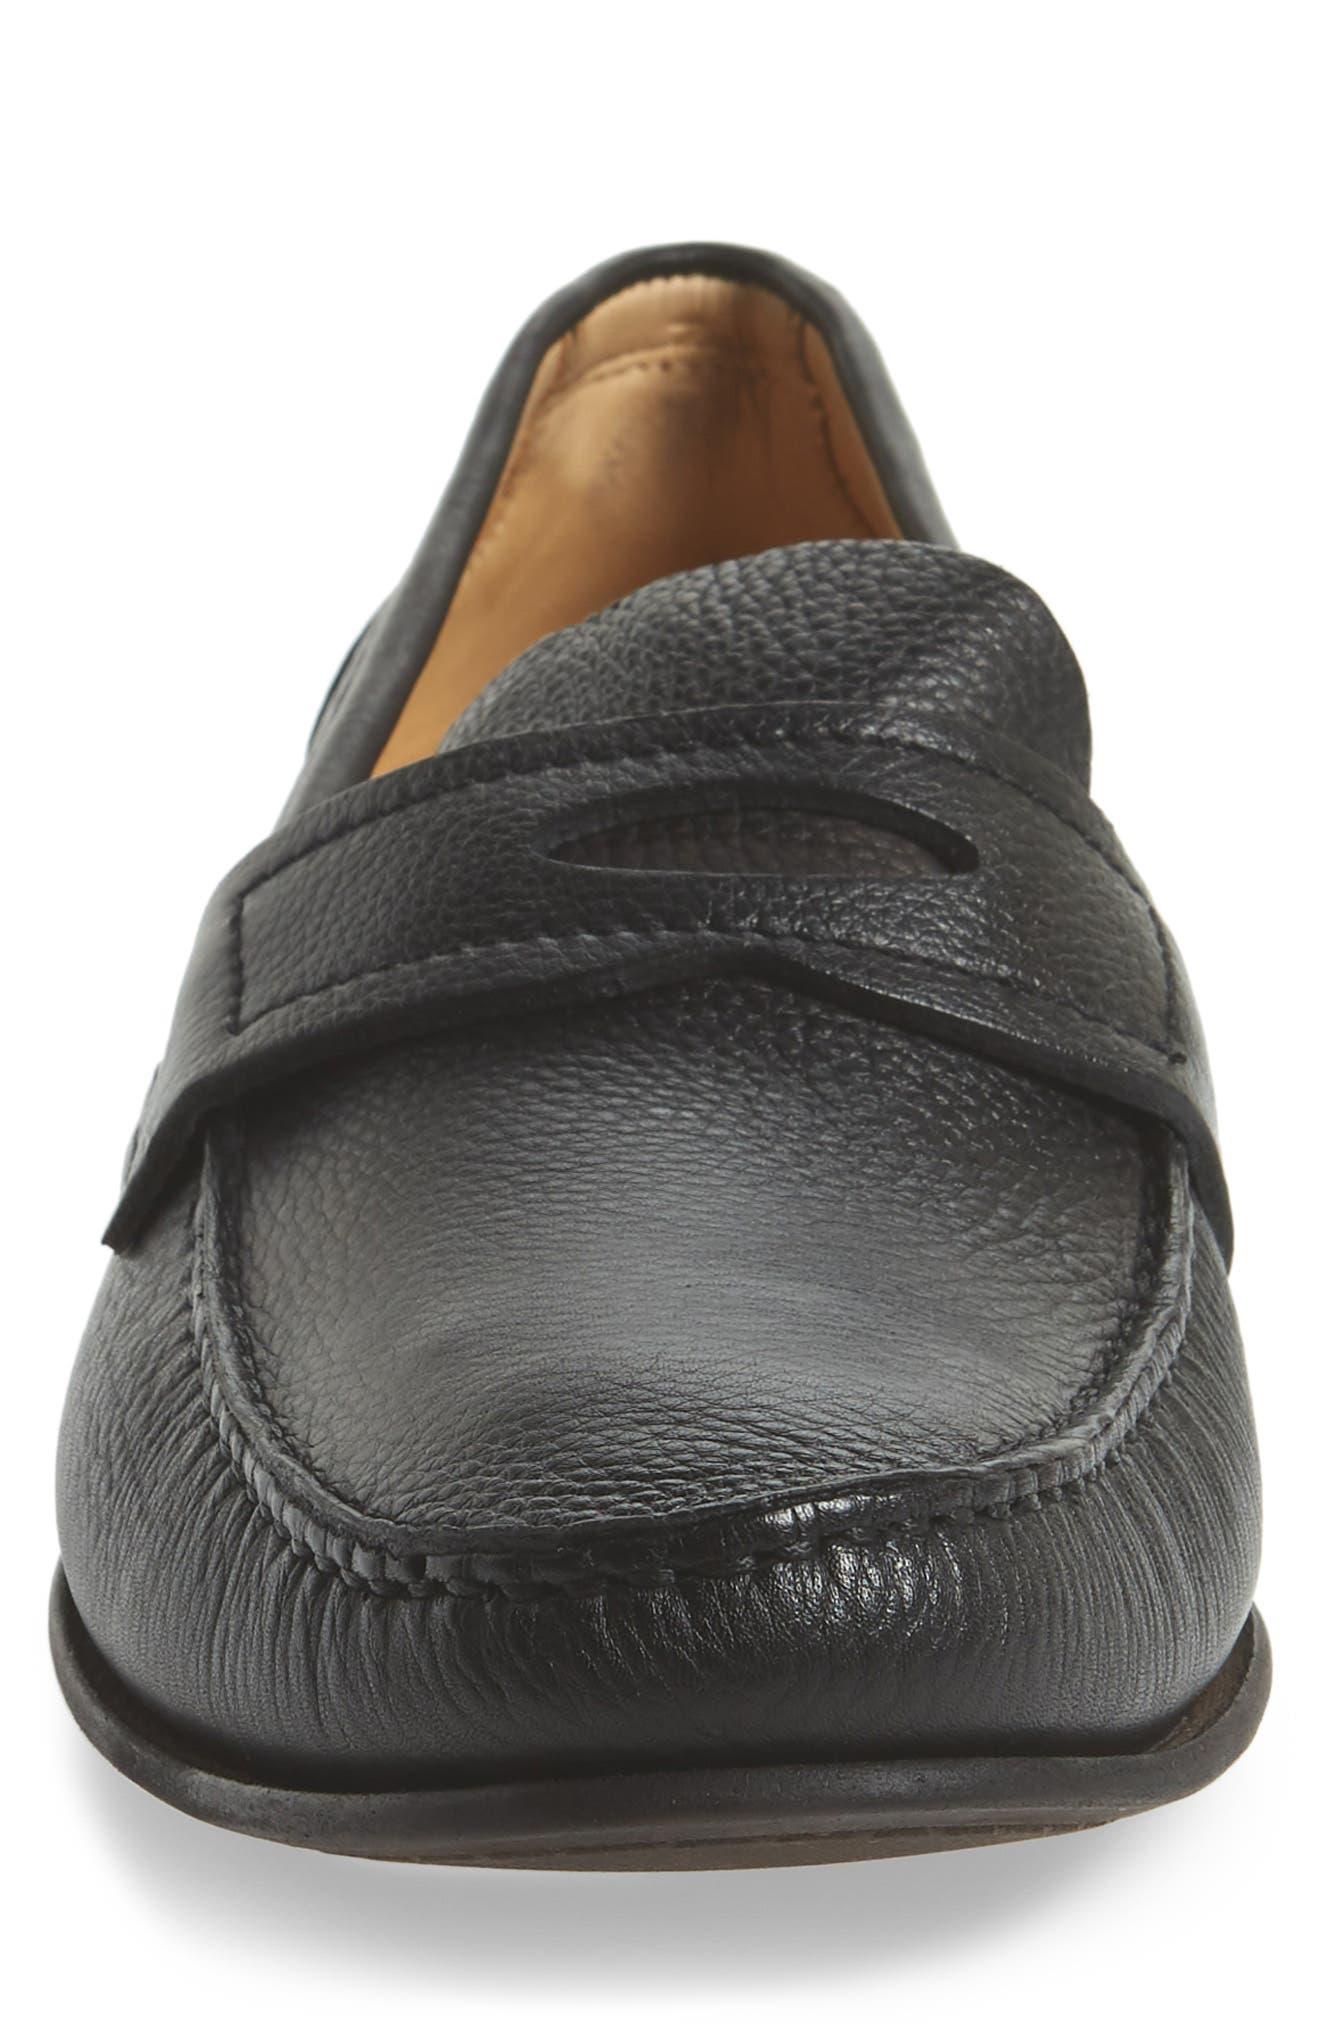 Eric Moc Toe Slip-On Loafer,                             Alternate thumbnail 4, color,                             Floater Black Leather